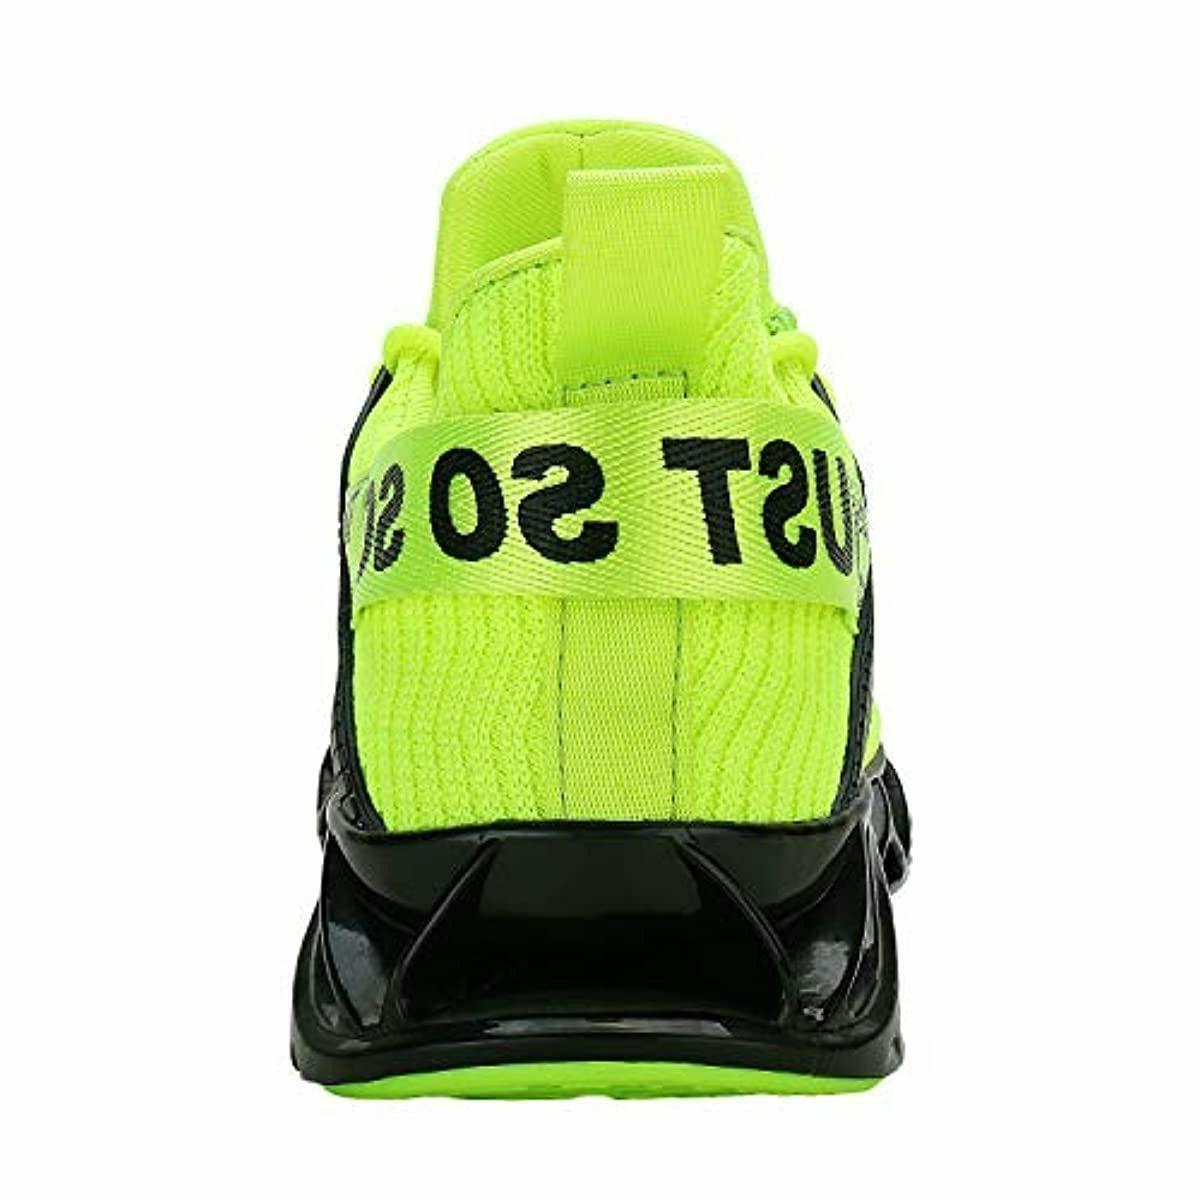 UMYOGO Mens Athletic Blade Fashion Sneakers